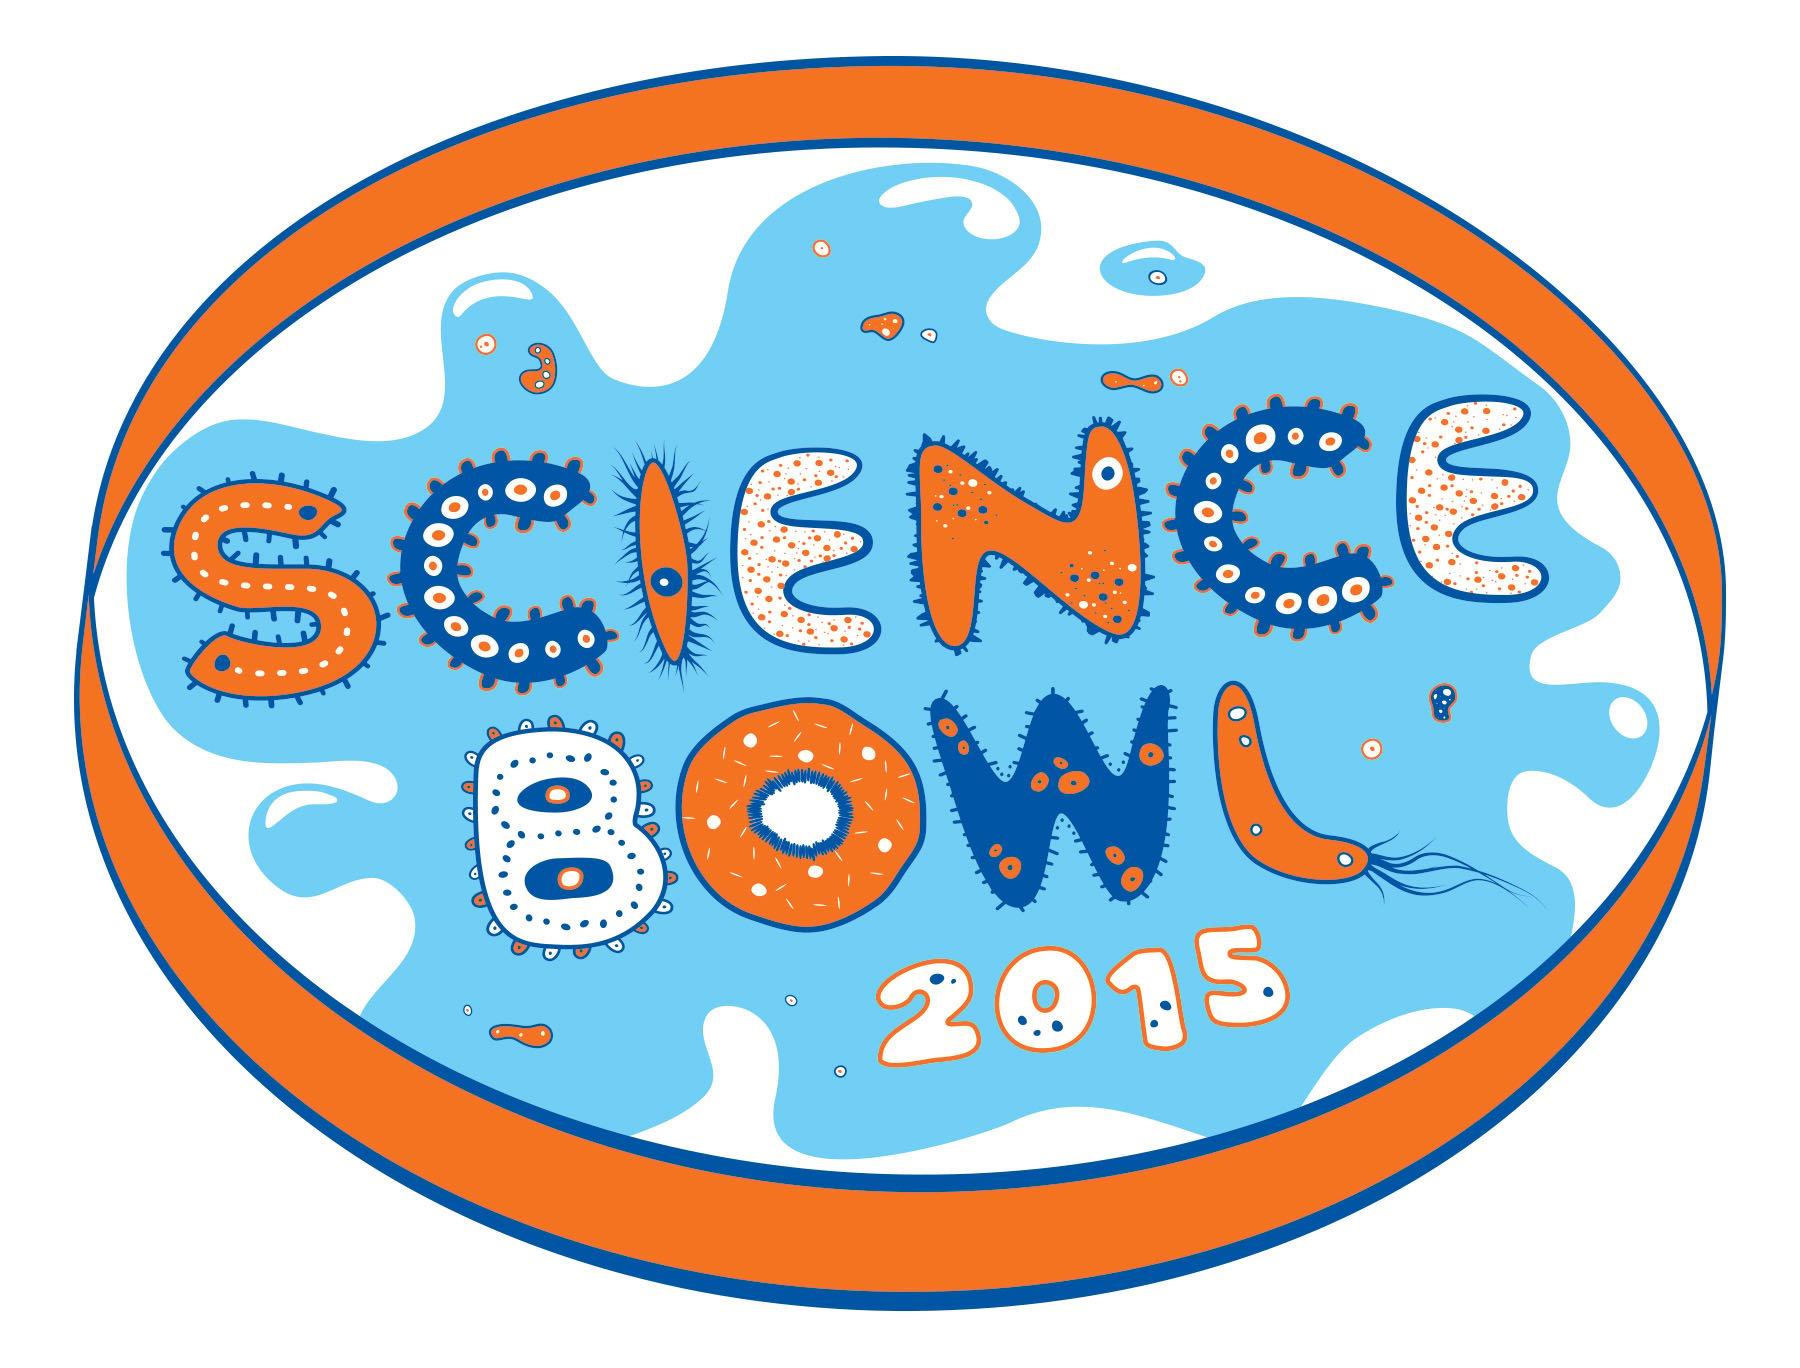 Science Bowl 2015 Branding